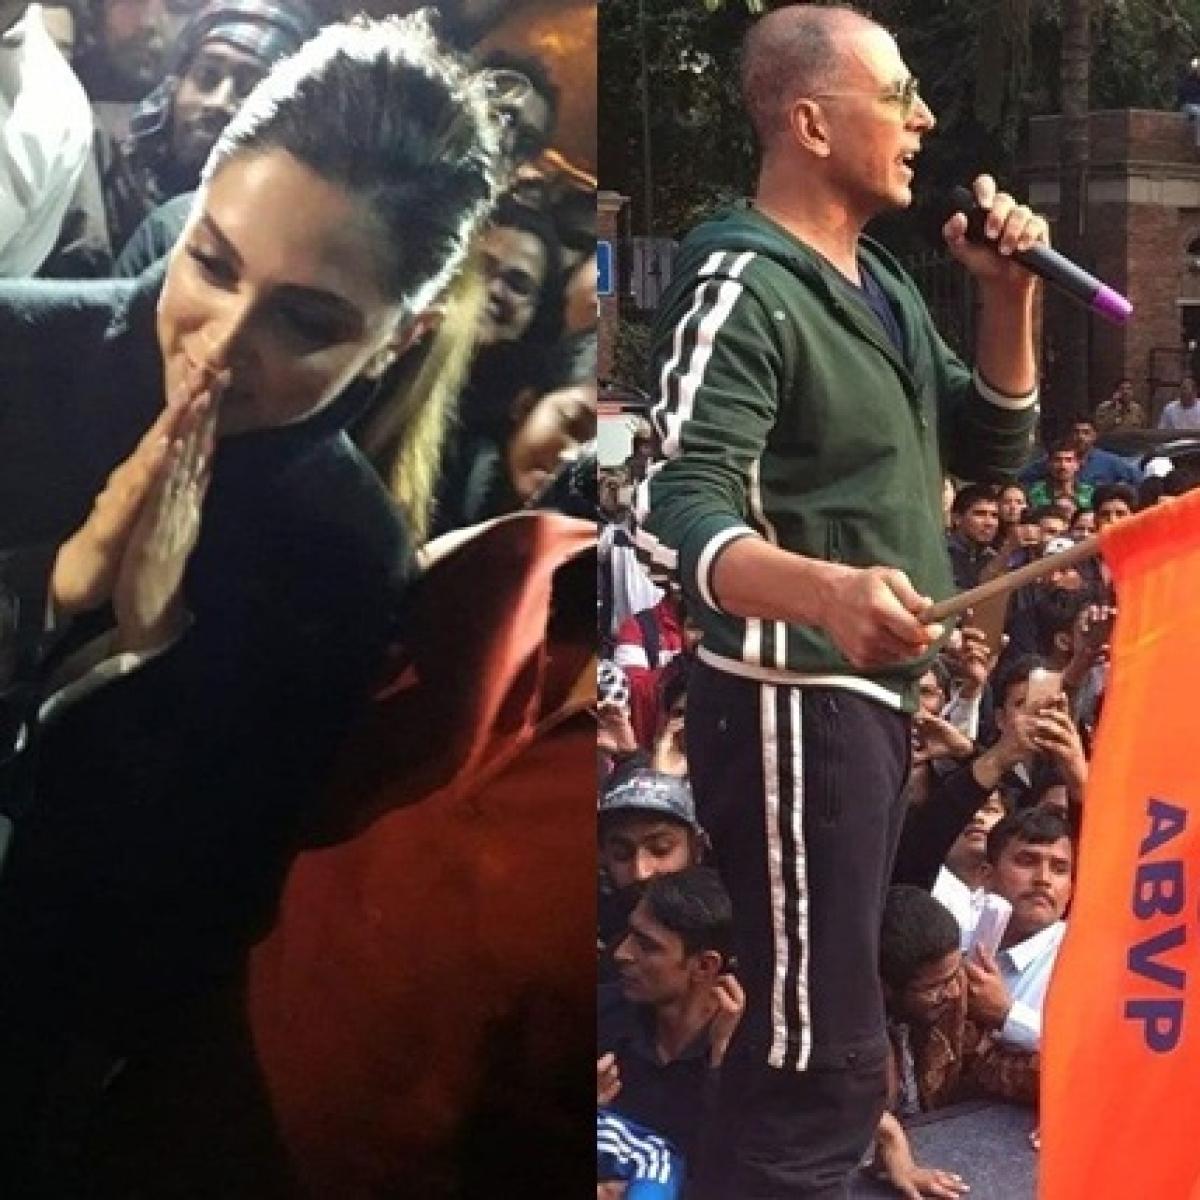 'Better than being a fence sitter': Milind Deora backs Deepika Padukone for visiting JNU, Akshay Kumar for raising ABVP flag